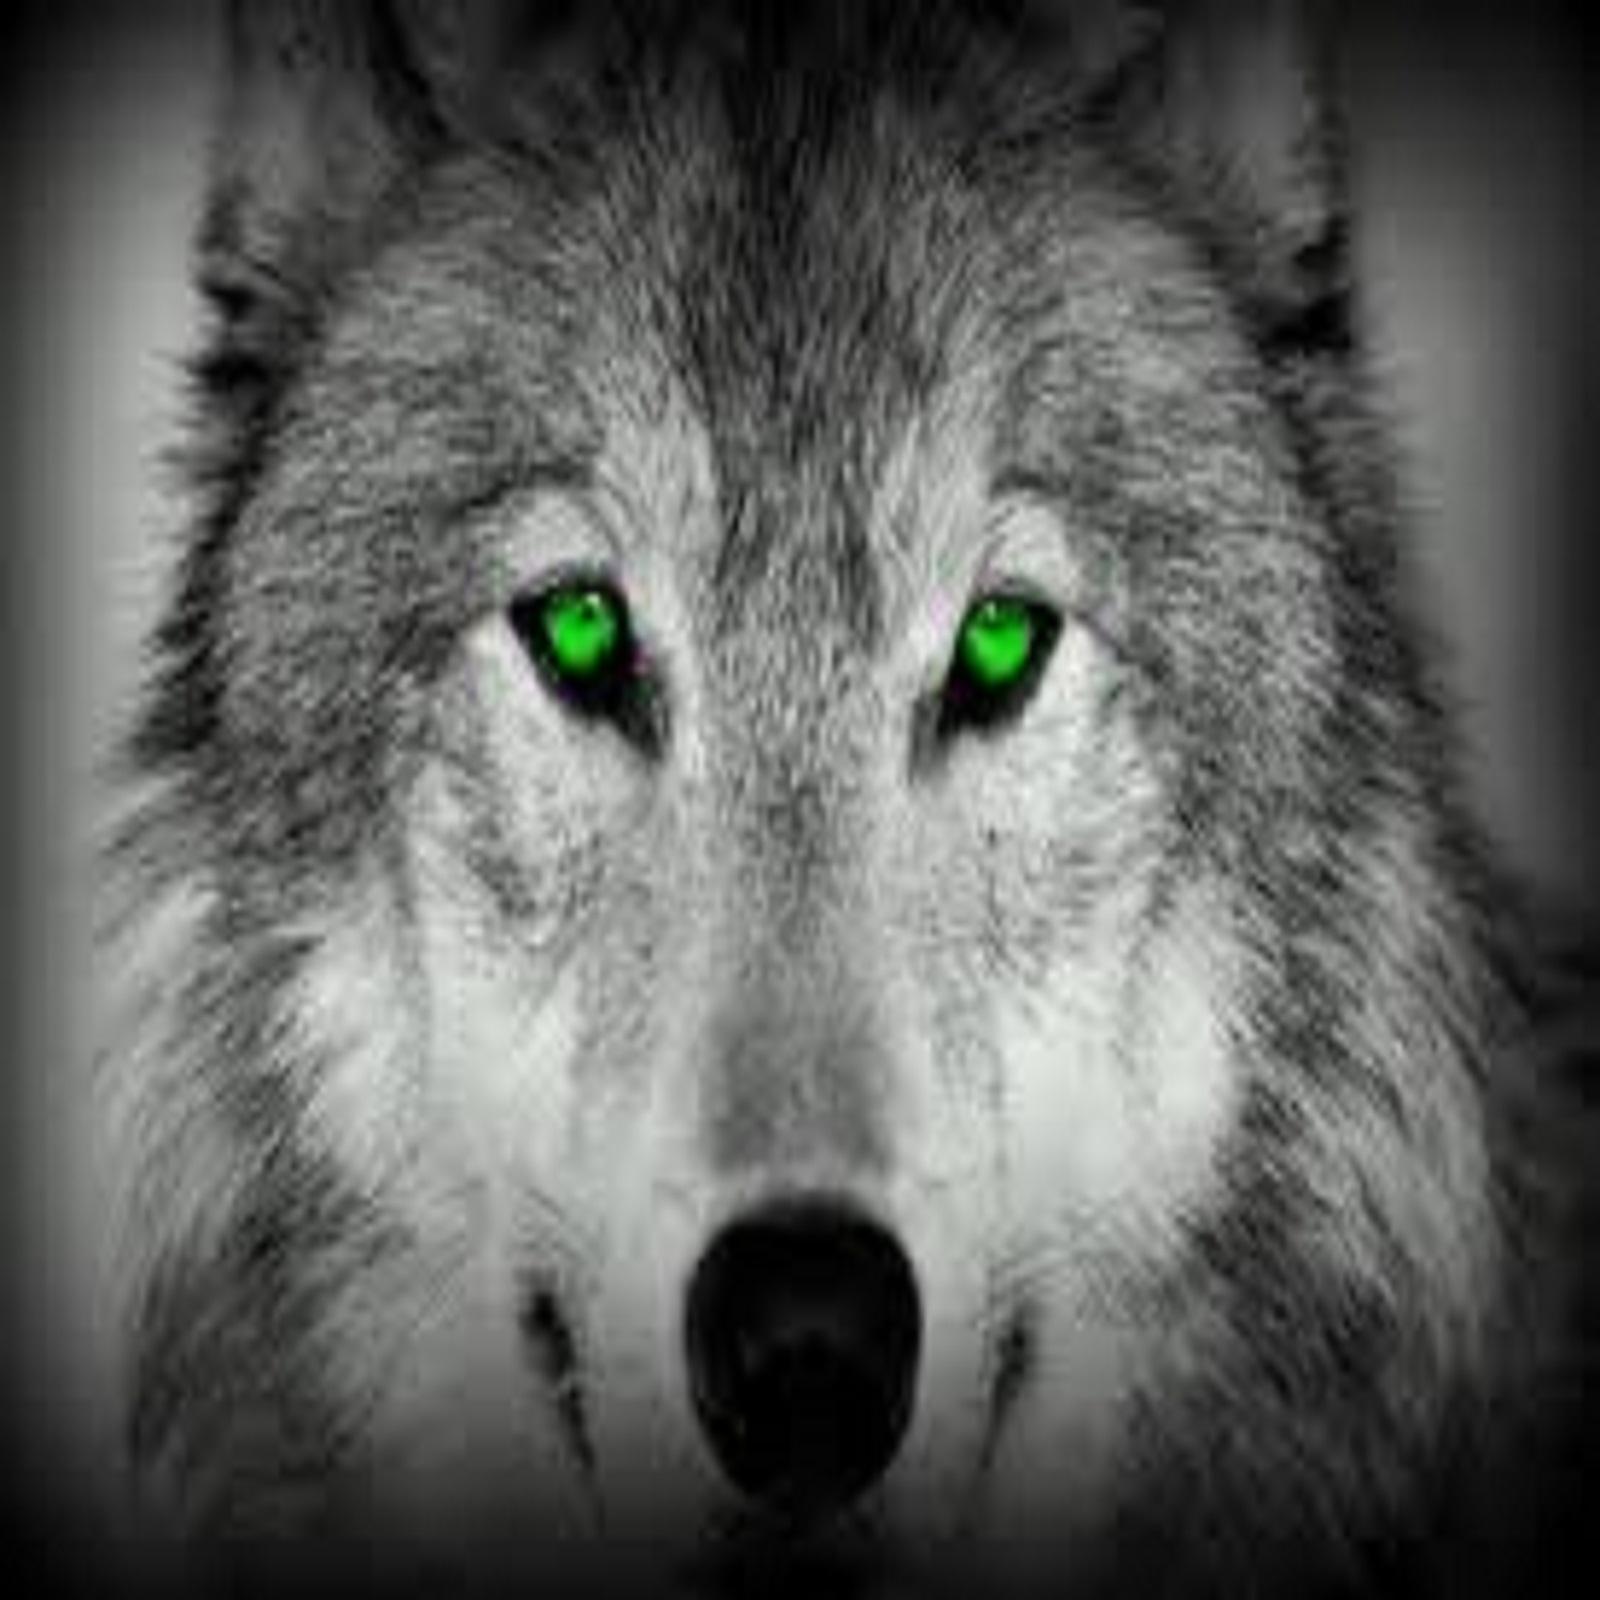 wolf green - Wolf lovers place Photo (33387639) - Fanpop